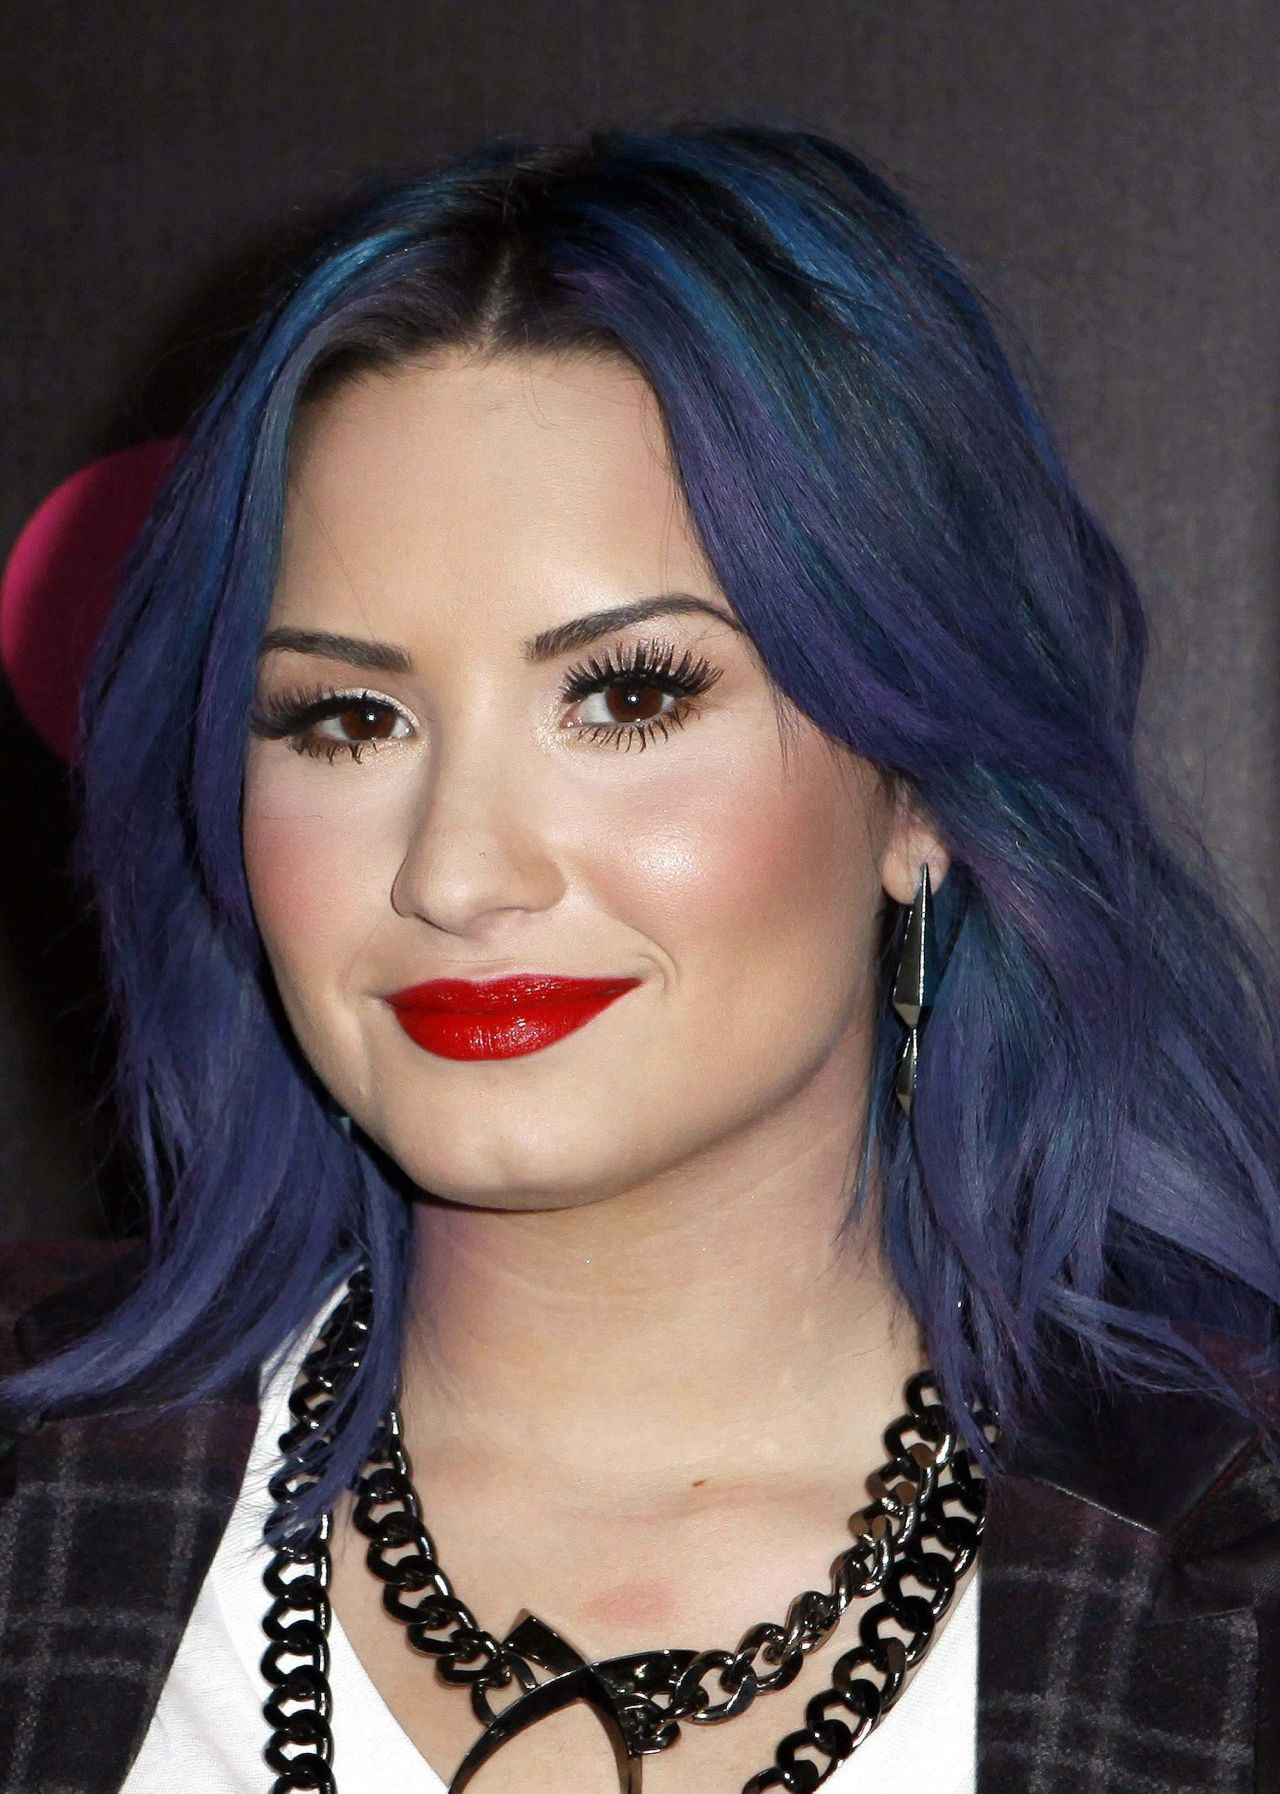 Demi Lovato At Nylon Cover Party December 2013